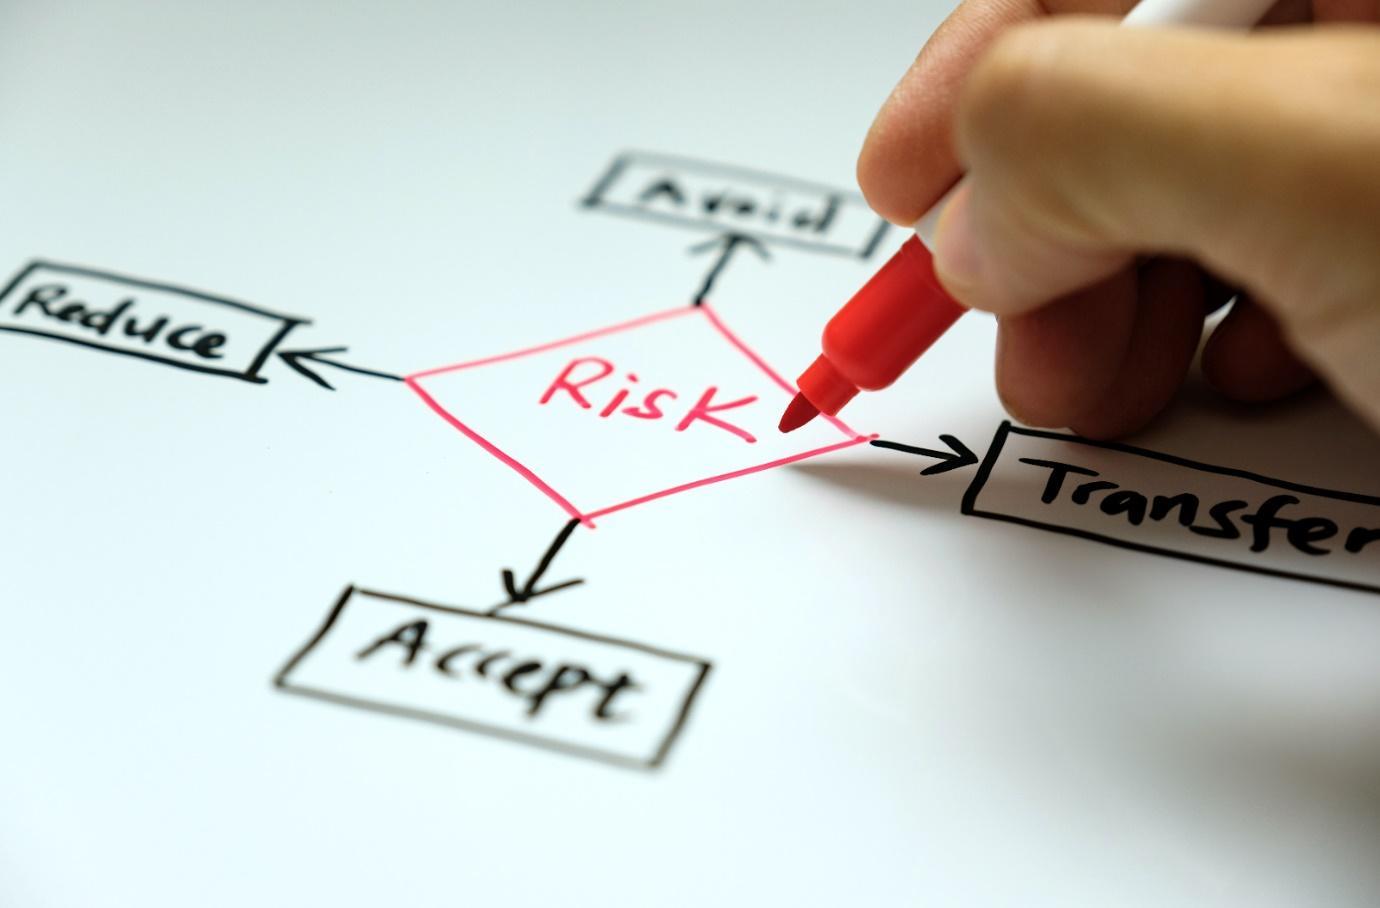 mitigating risks diagram